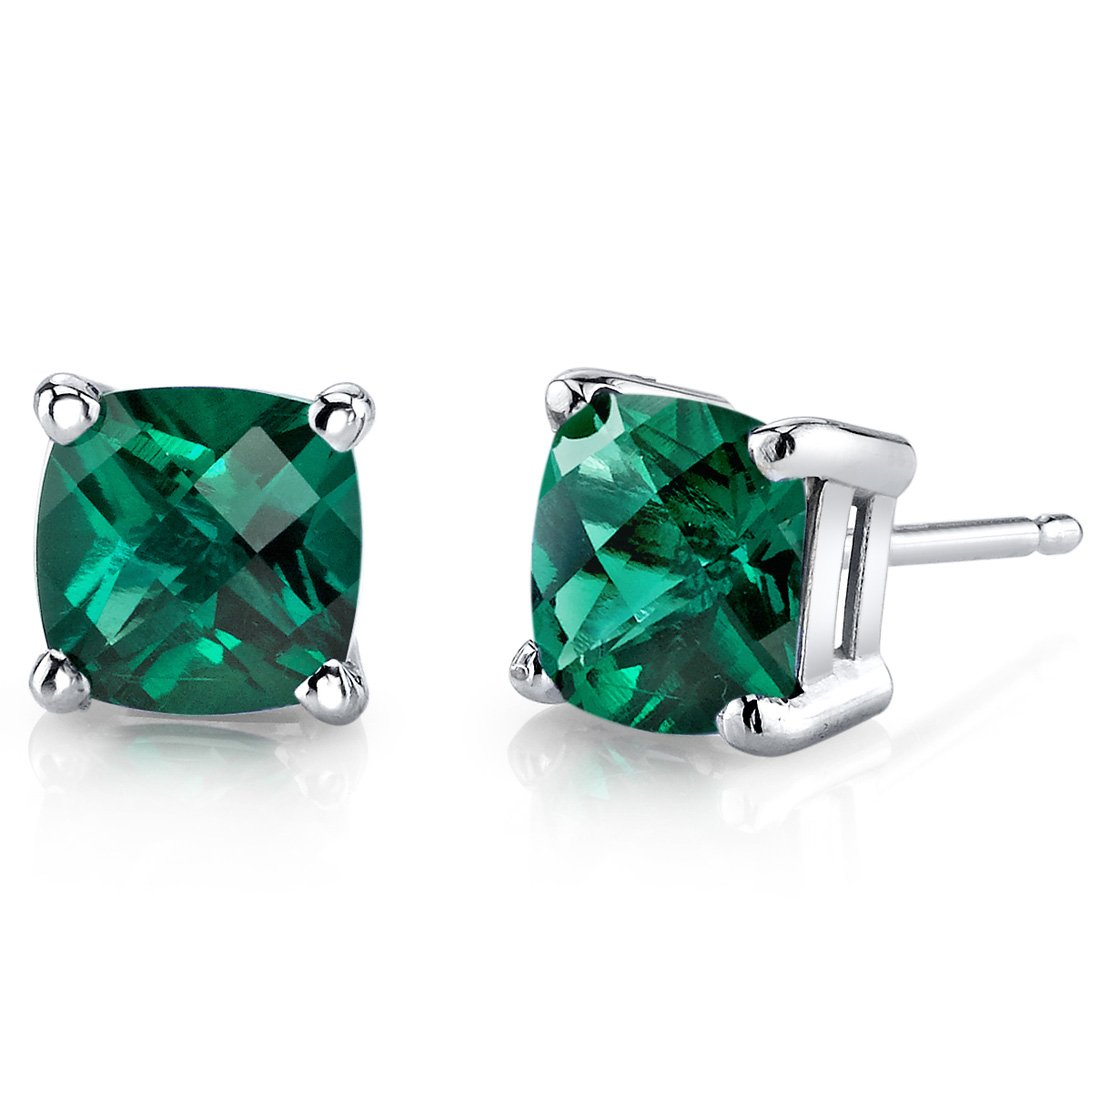 14 Karat White Gold Cushion Cut 1.75 Carats Created Emerald Stud Earrings